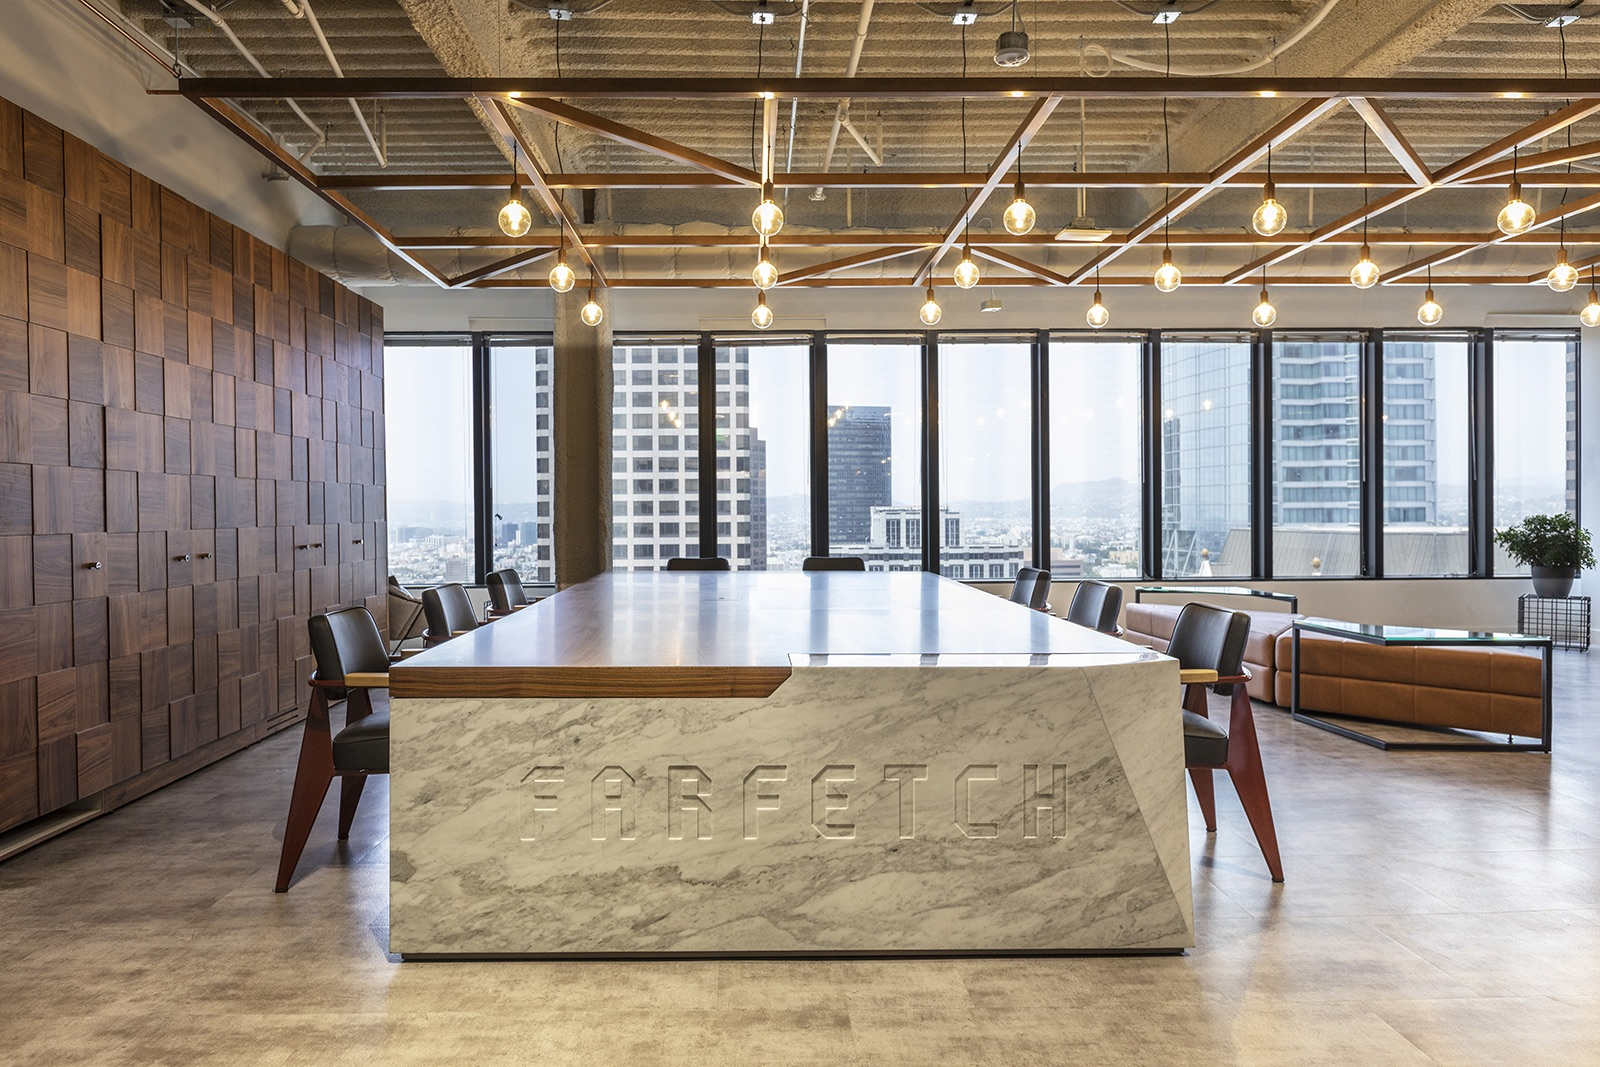 farfetch-los-angeles-office-1